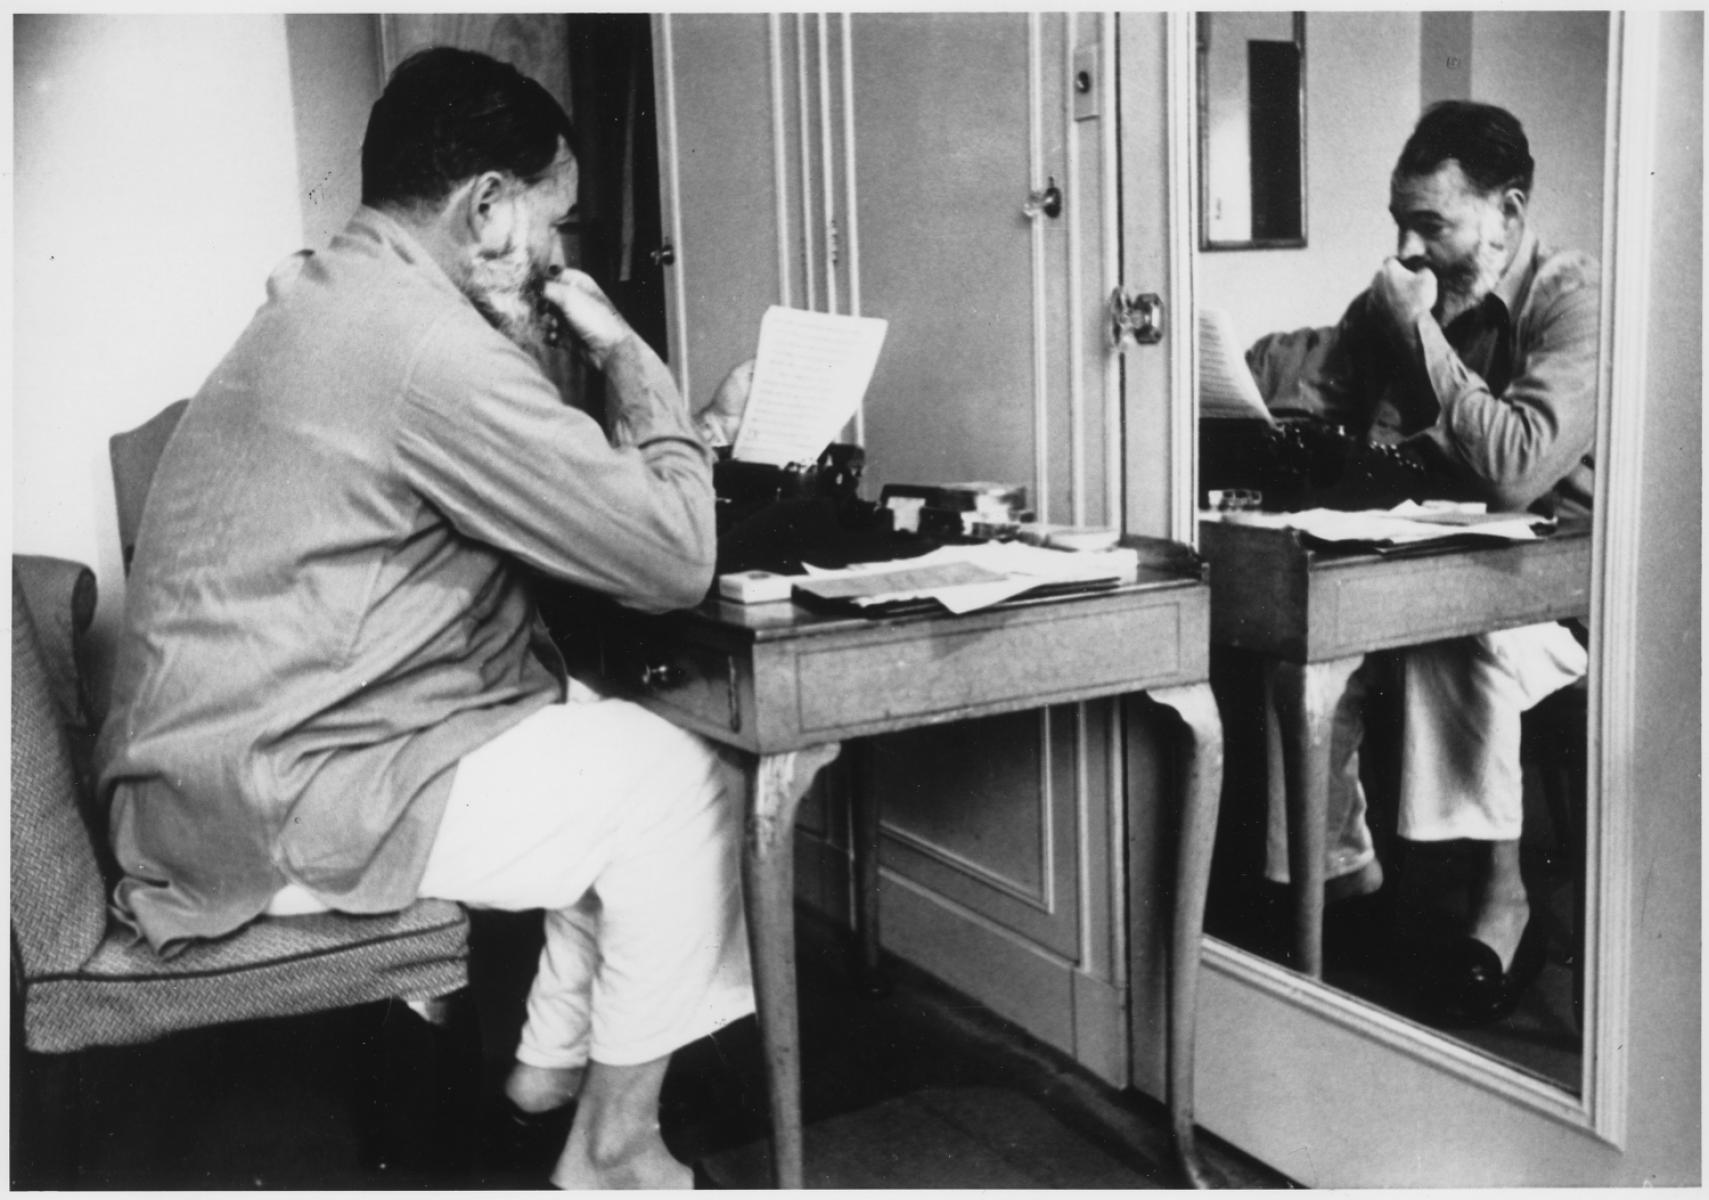 Oxford Exchange Papa's Day Hemingway Book Event